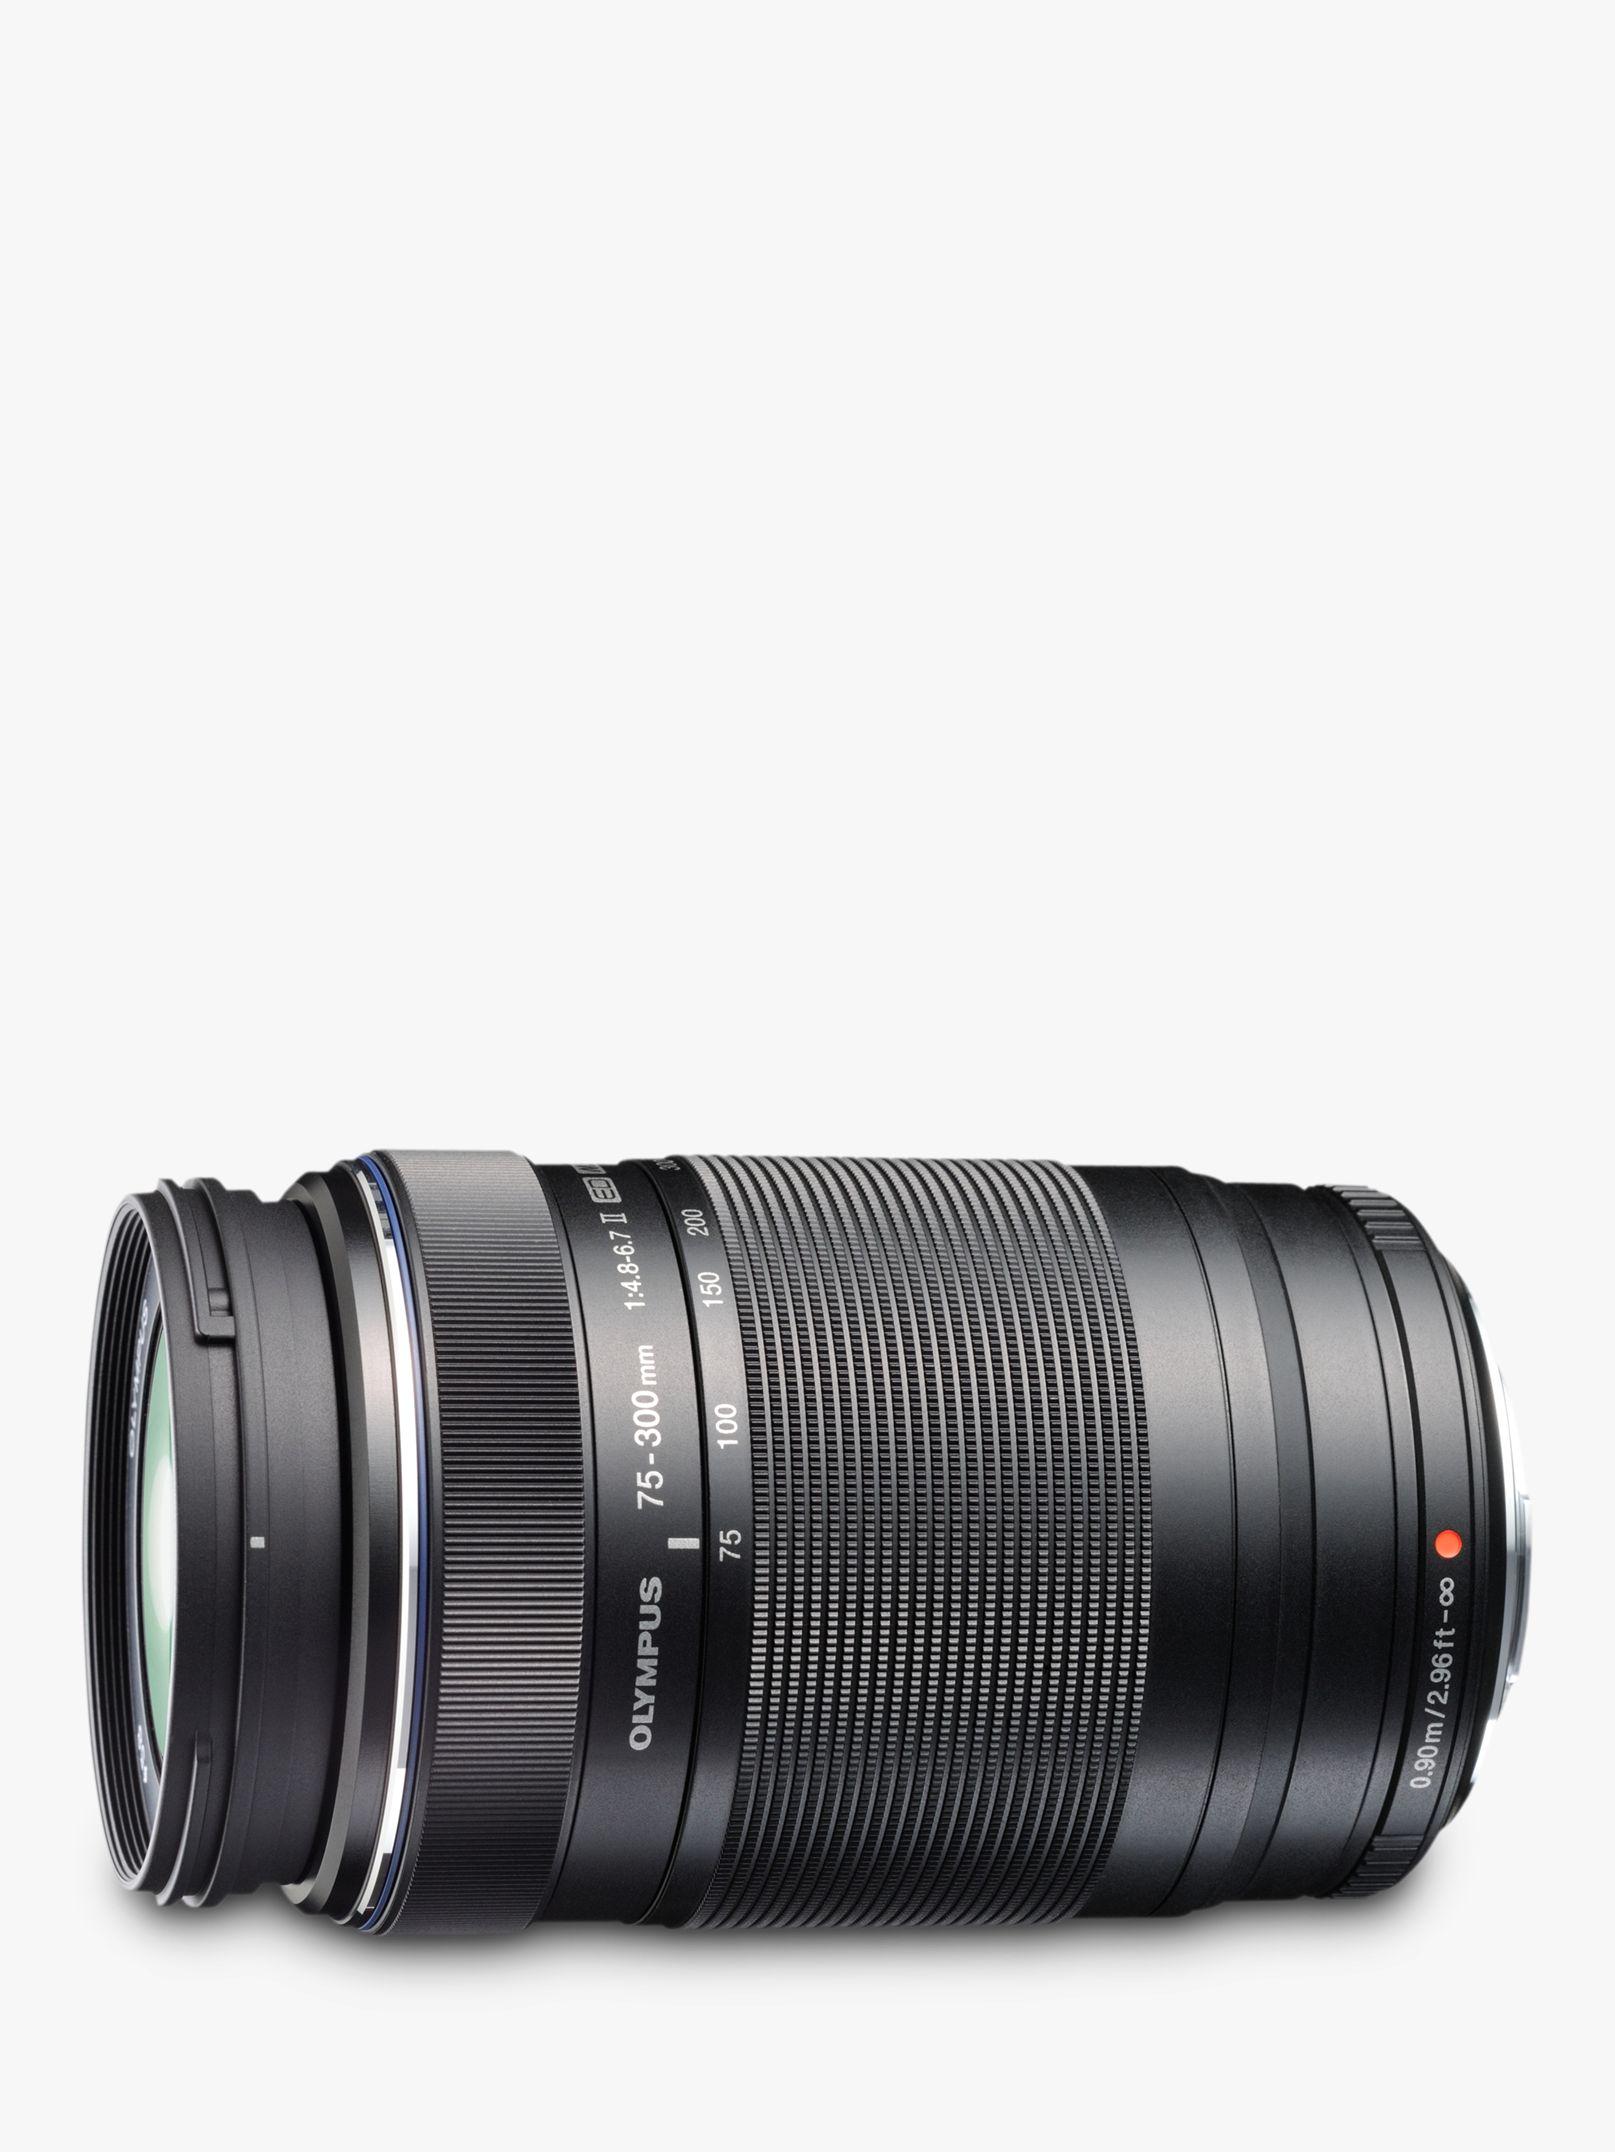 Olympus Olympus M.ZUIKO DIGITAL 75-300mm f/4.8-6.7 II ED Telephoto Lens